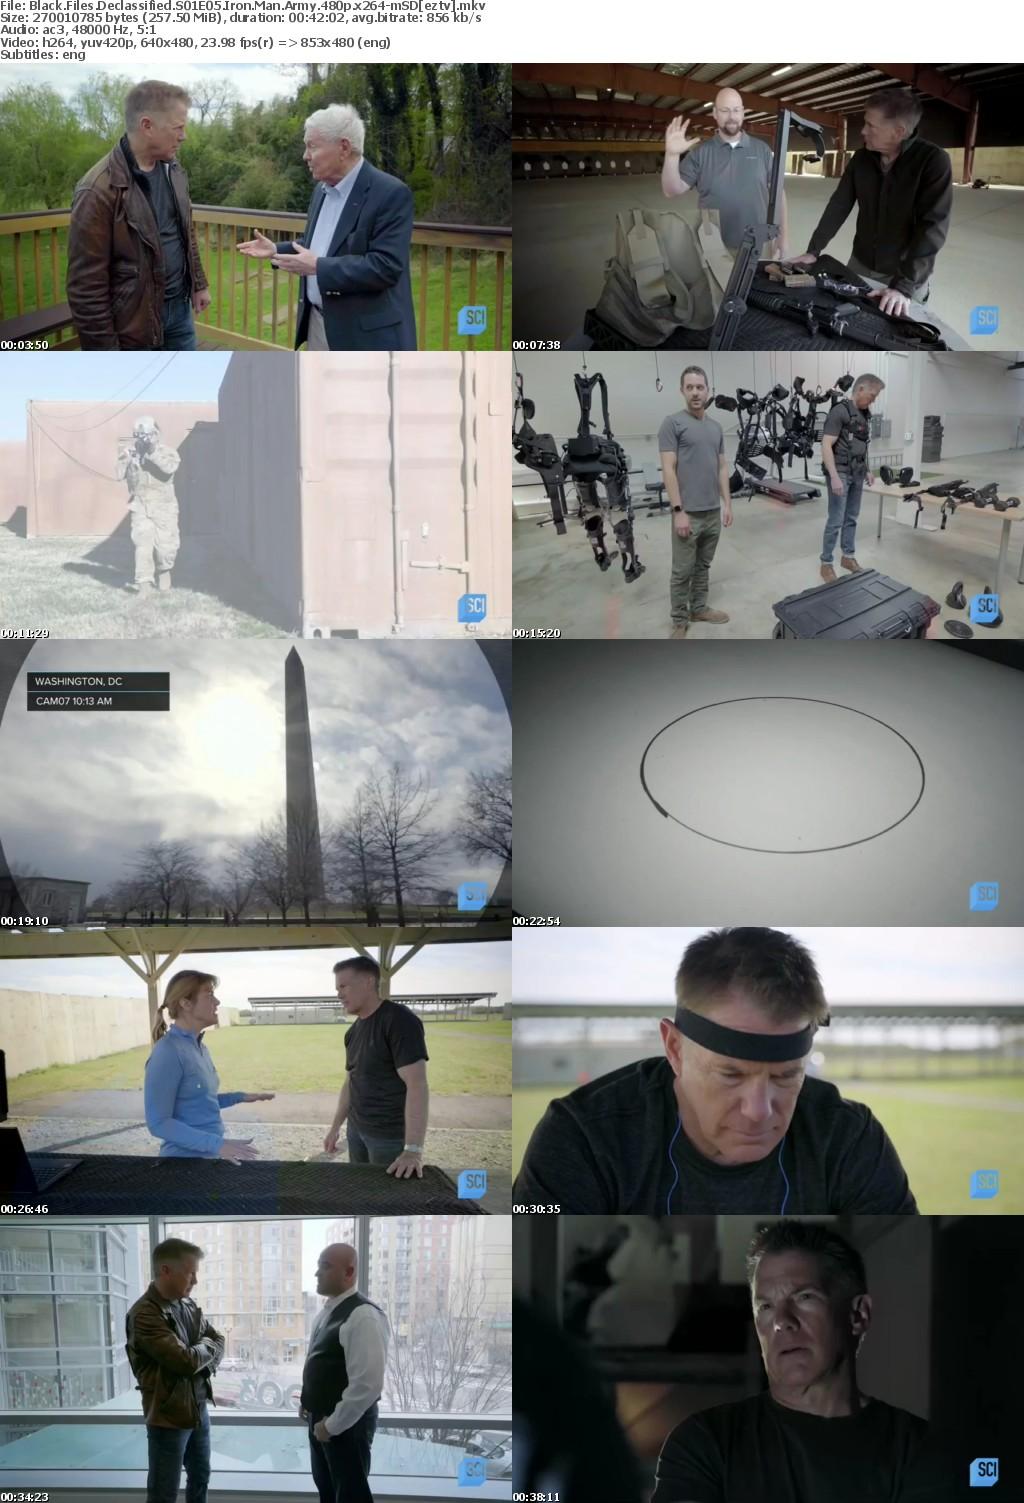 Black Files Declassified S01E05 Iron Man Army 480p x264-mSD